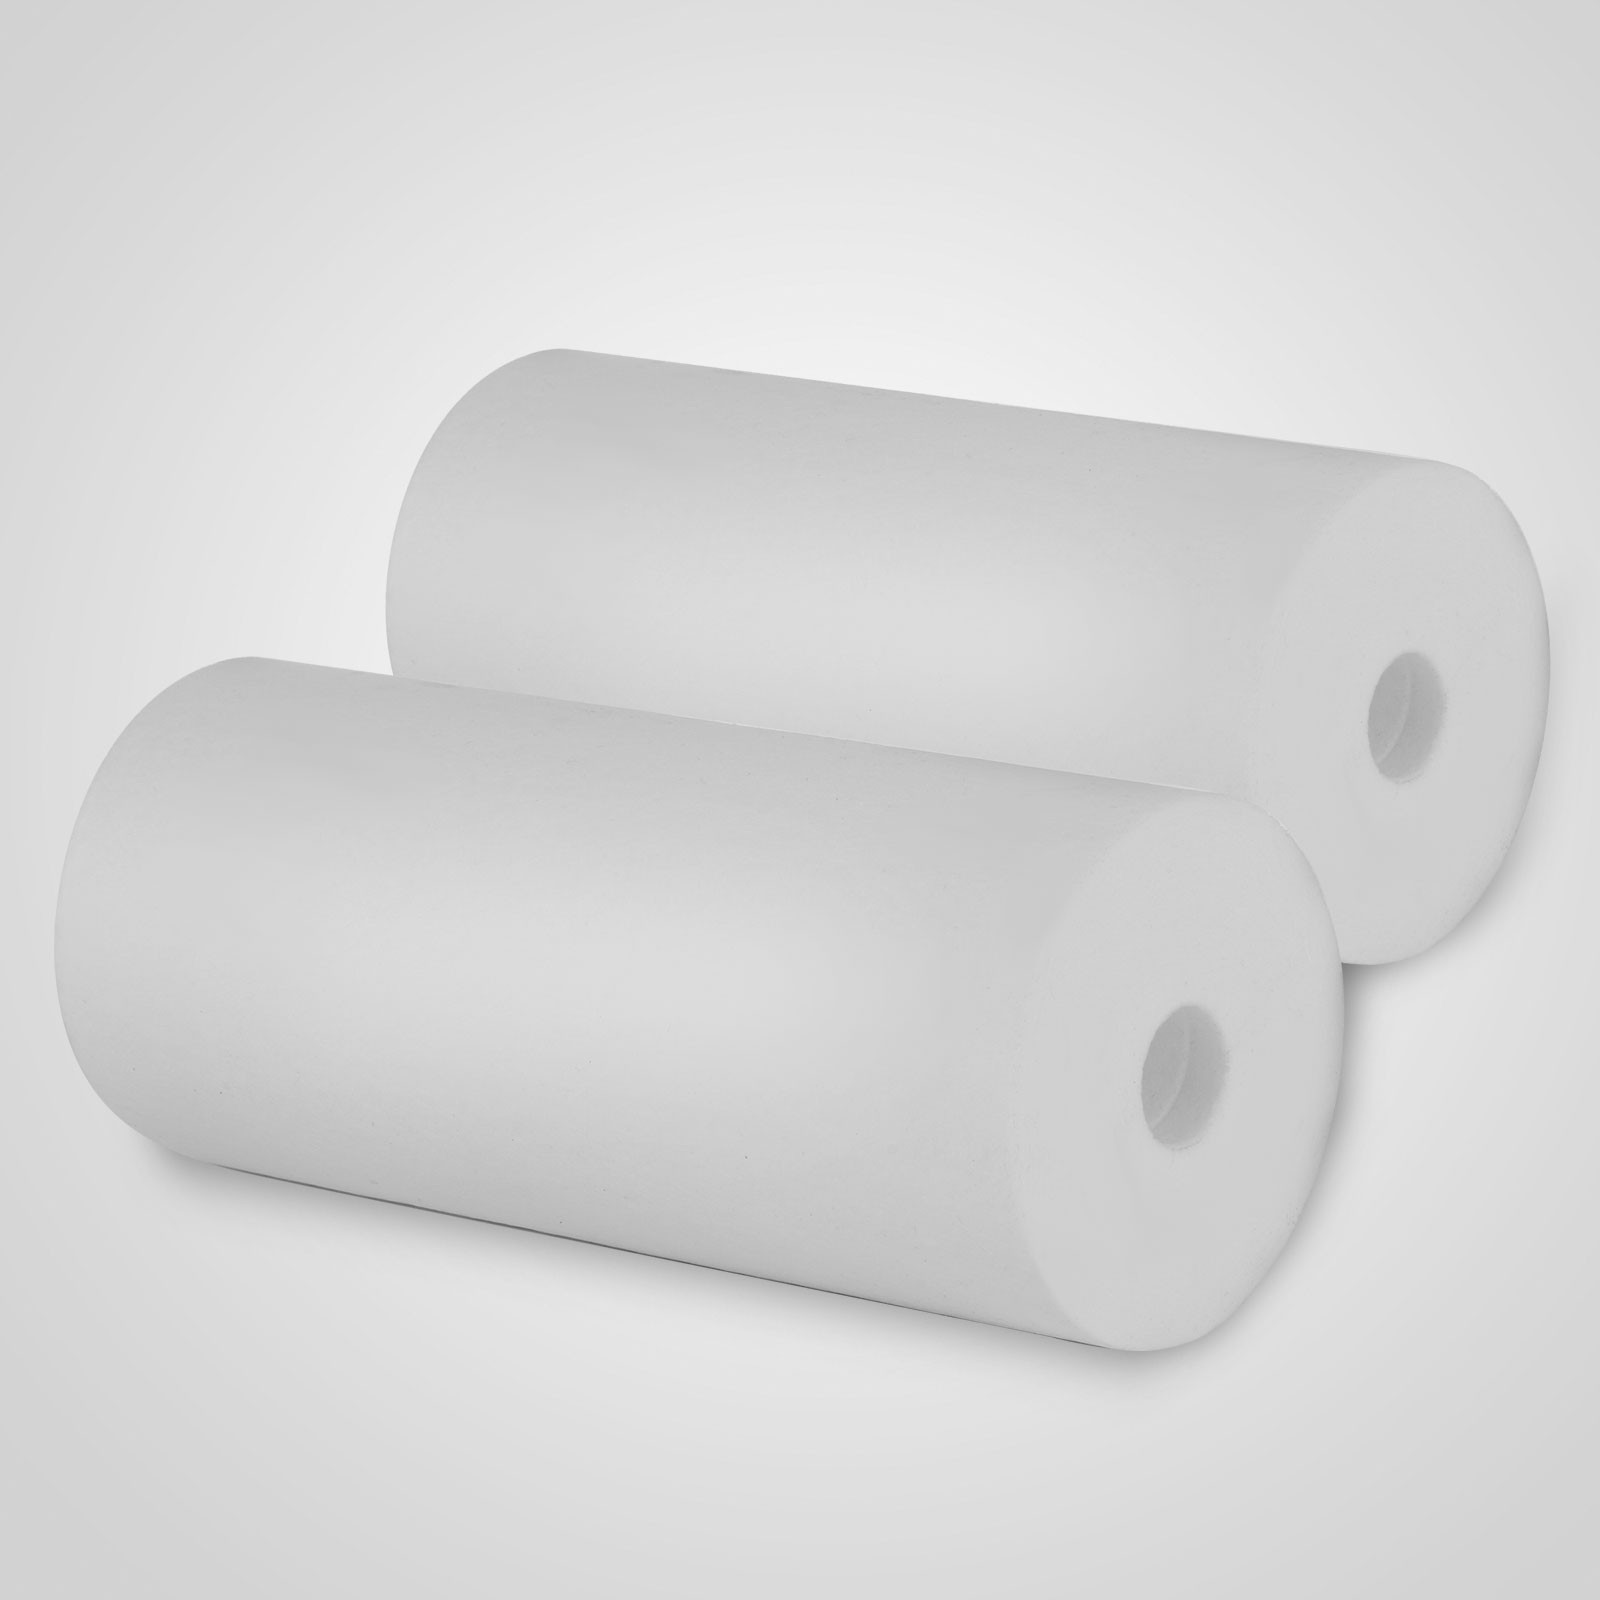 20Pcs-Cartouche-Filtrante-5-Micron-10-034-X-4-5-034-as-Brita-Emballe-Individu-Bobine miniature 10